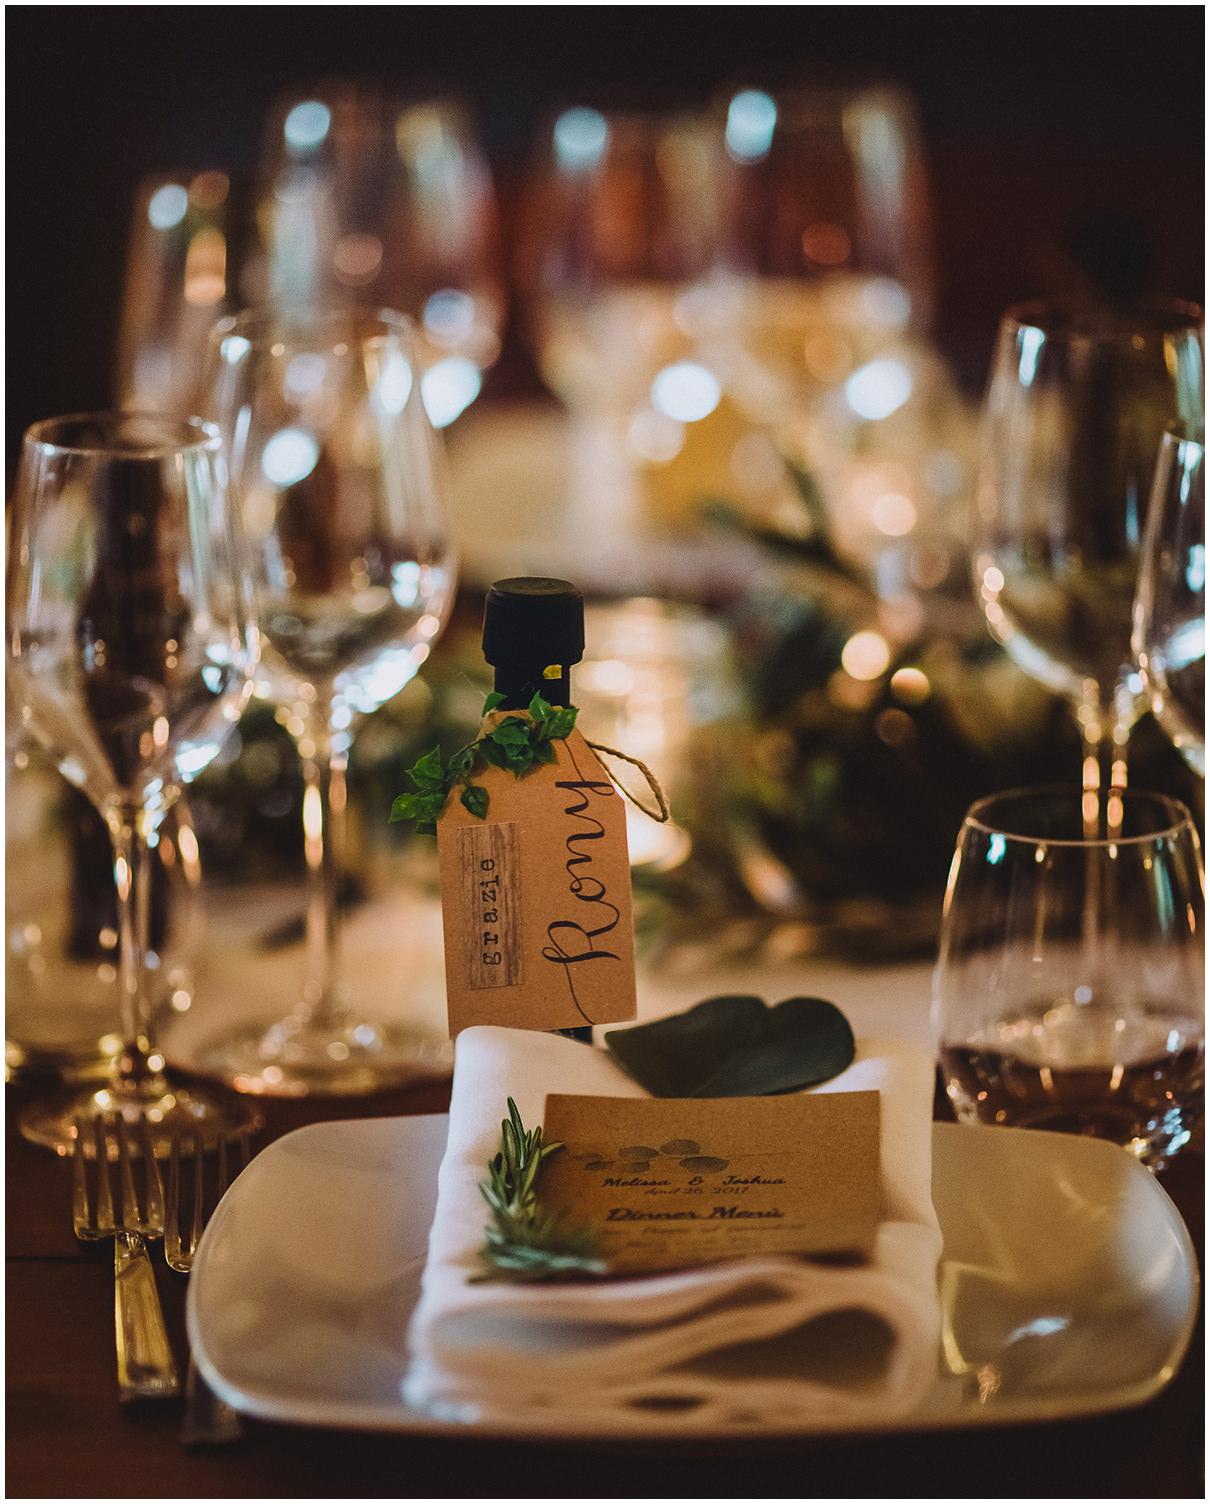 WEDDING-PHOTOGRAPHY-TUSCANY-SARA-LORENZONI-FOTOGRAFIA-MATRIMONIO-MELISSA-JOSHUA51